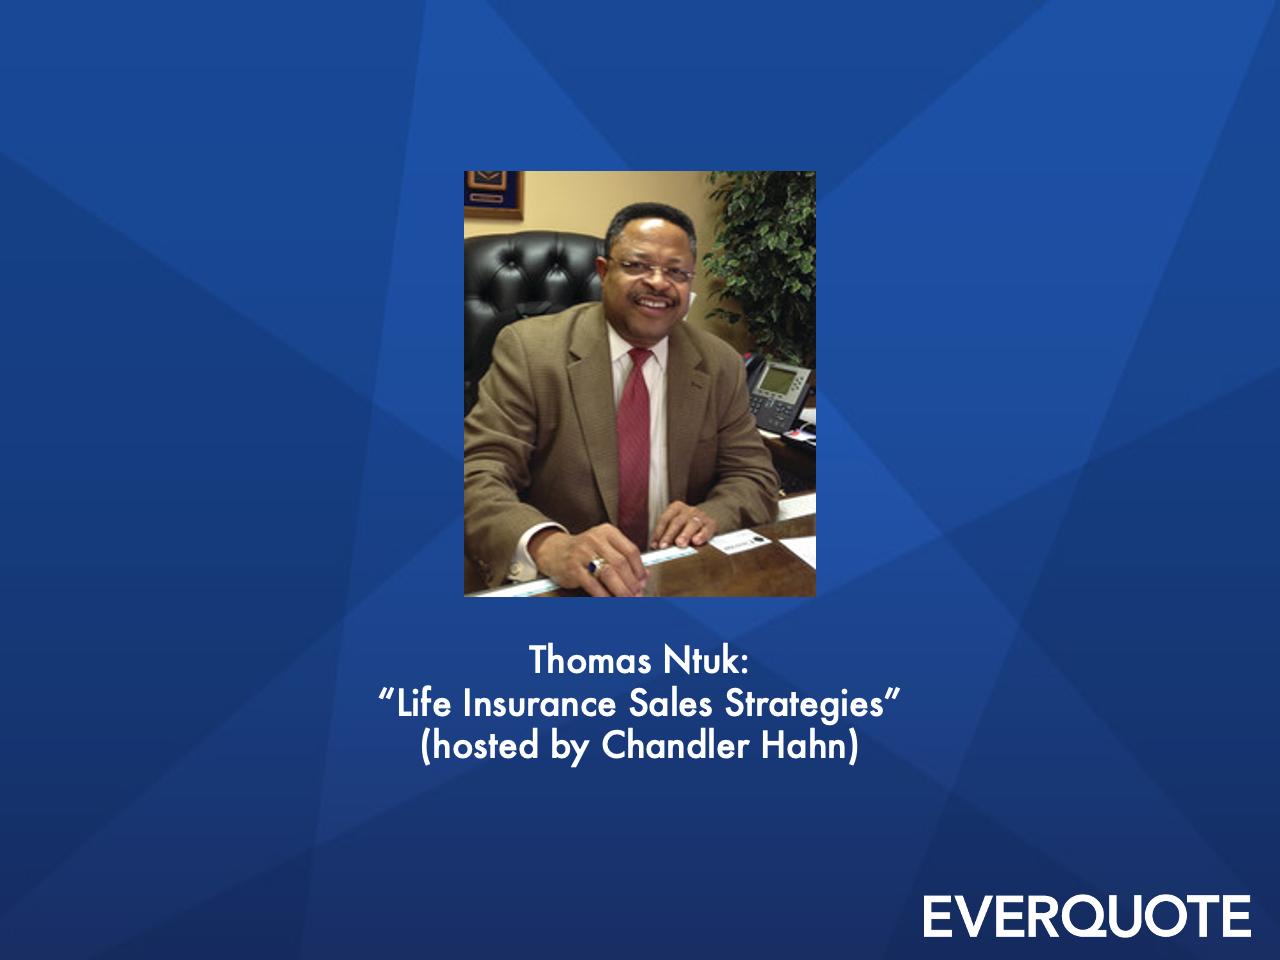 Life Insurance Sales Strategies with Thomas Ntuk